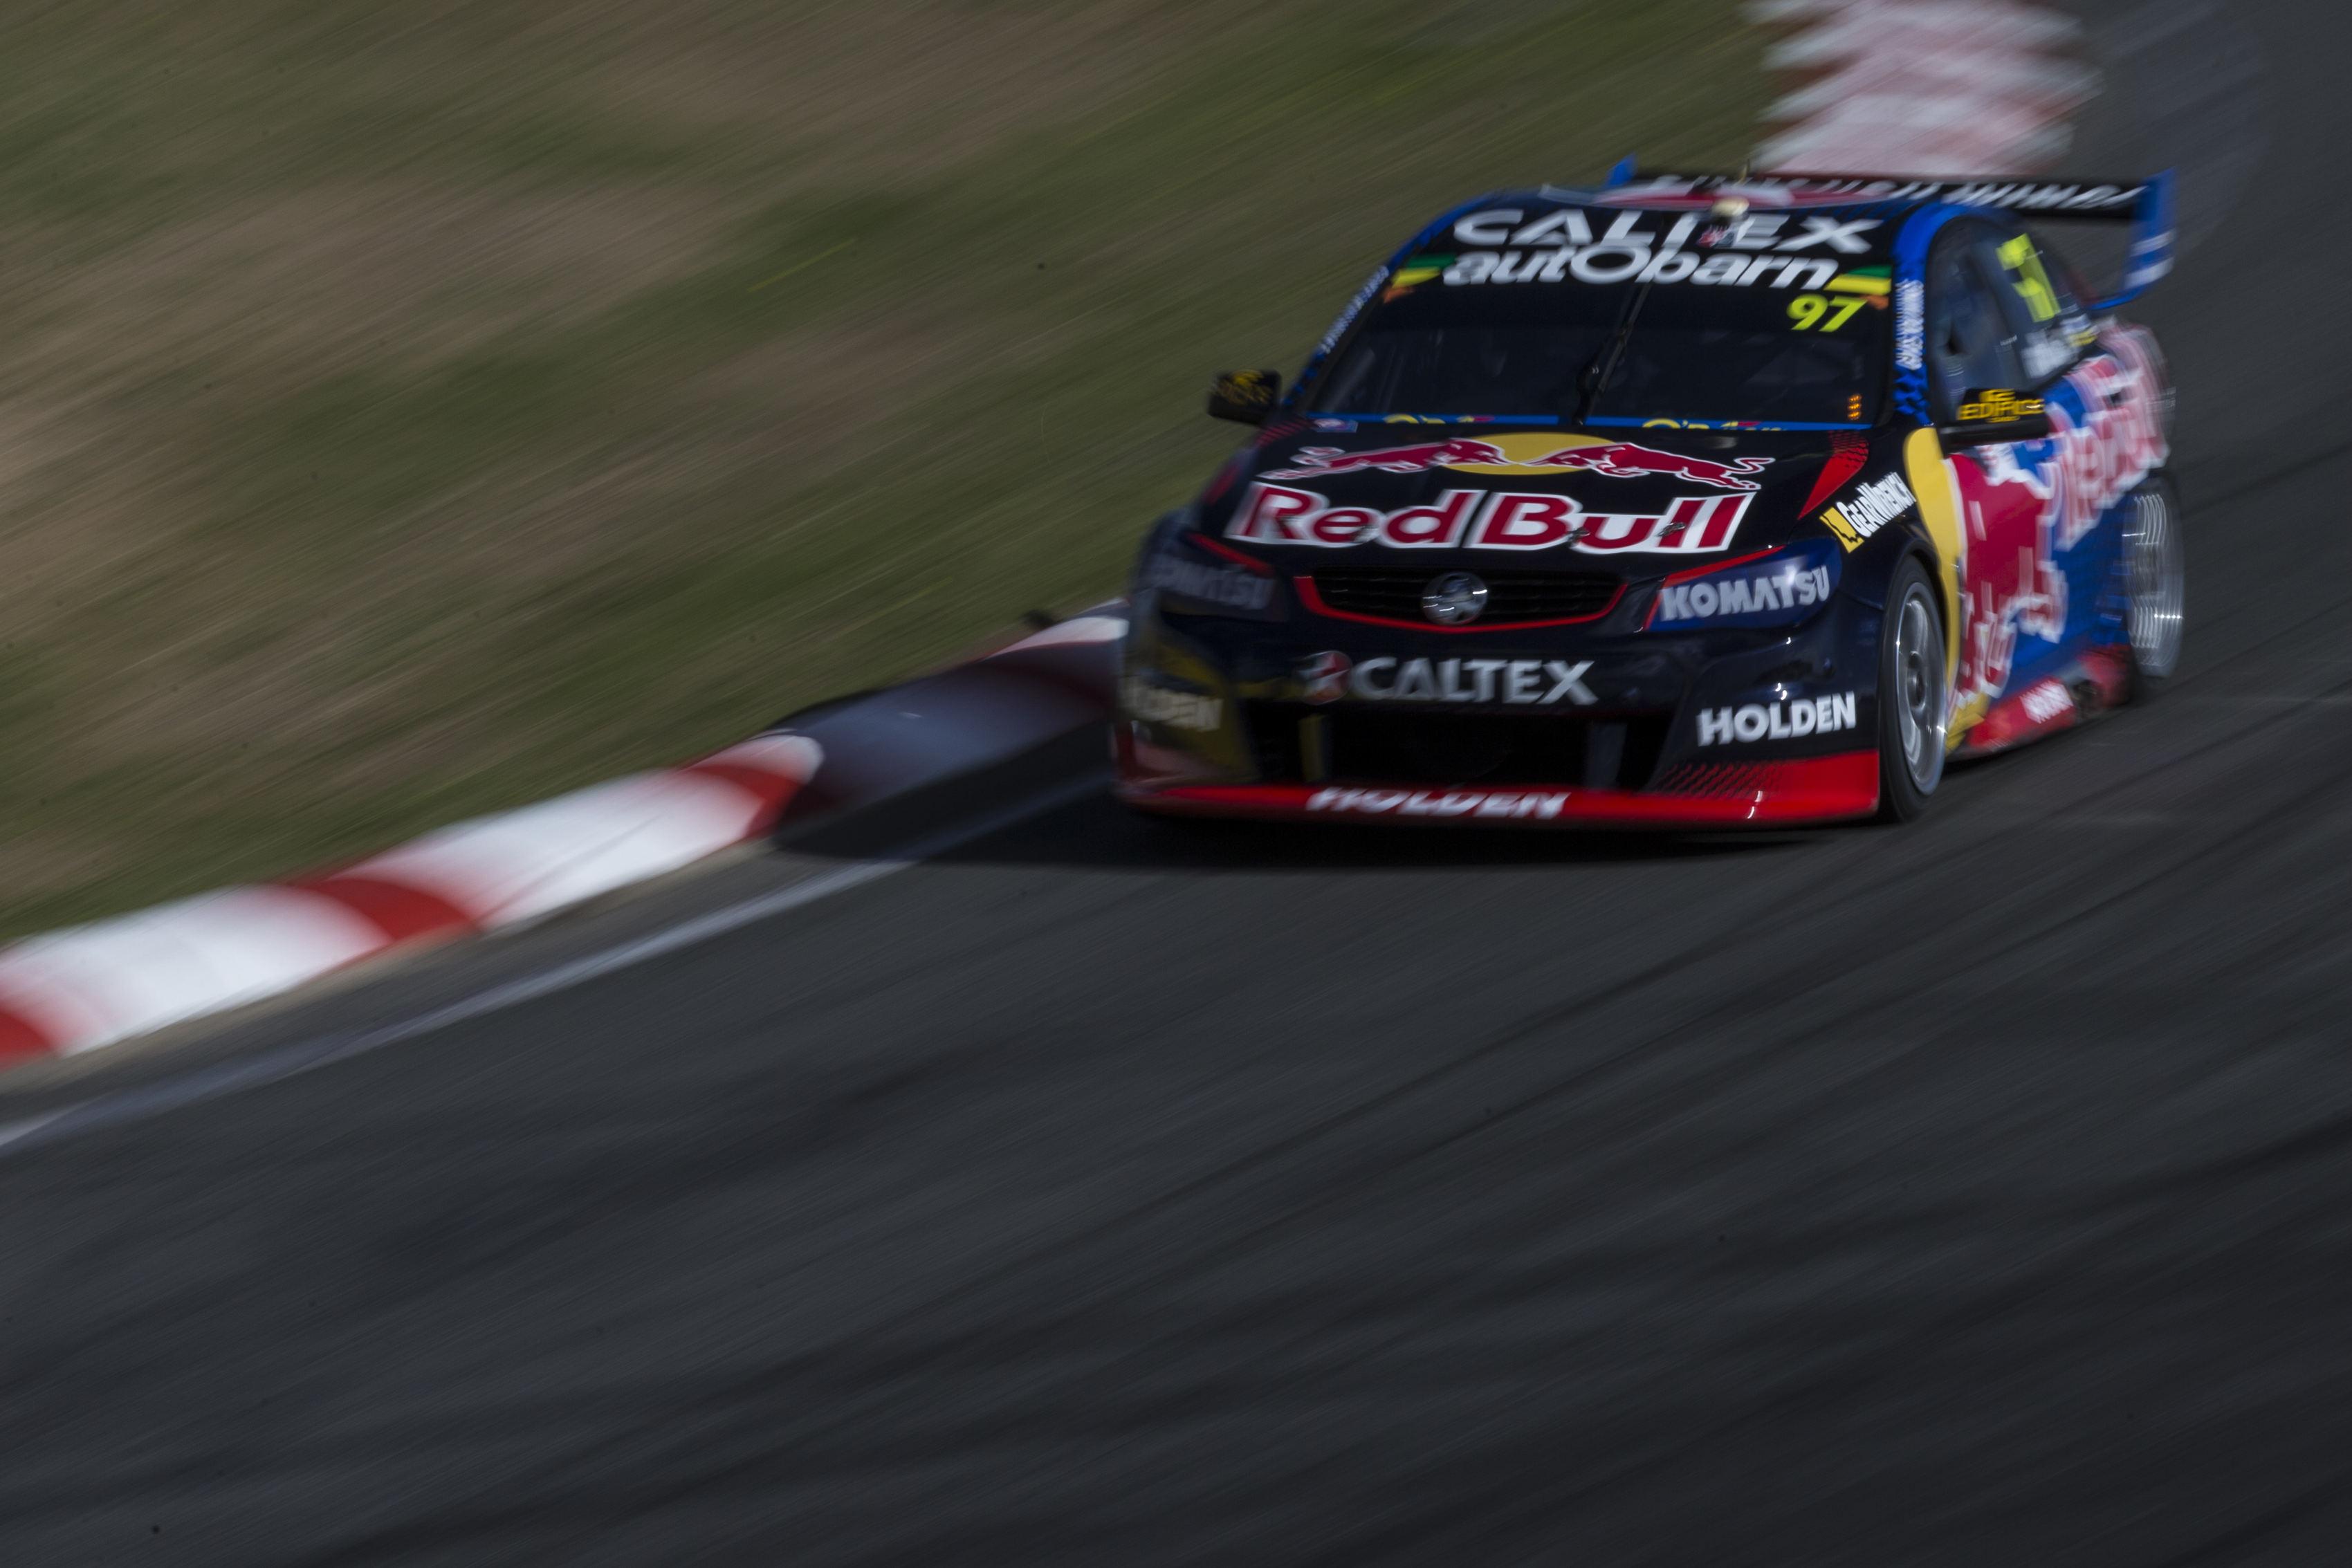 Shane Van Gisbergen of Red Bull Racing Australia during the Tyrepower Tasmania SuperSprint,  at the Symmons Plains Raceway, Launceston, Tasmania, April 02, 2016.